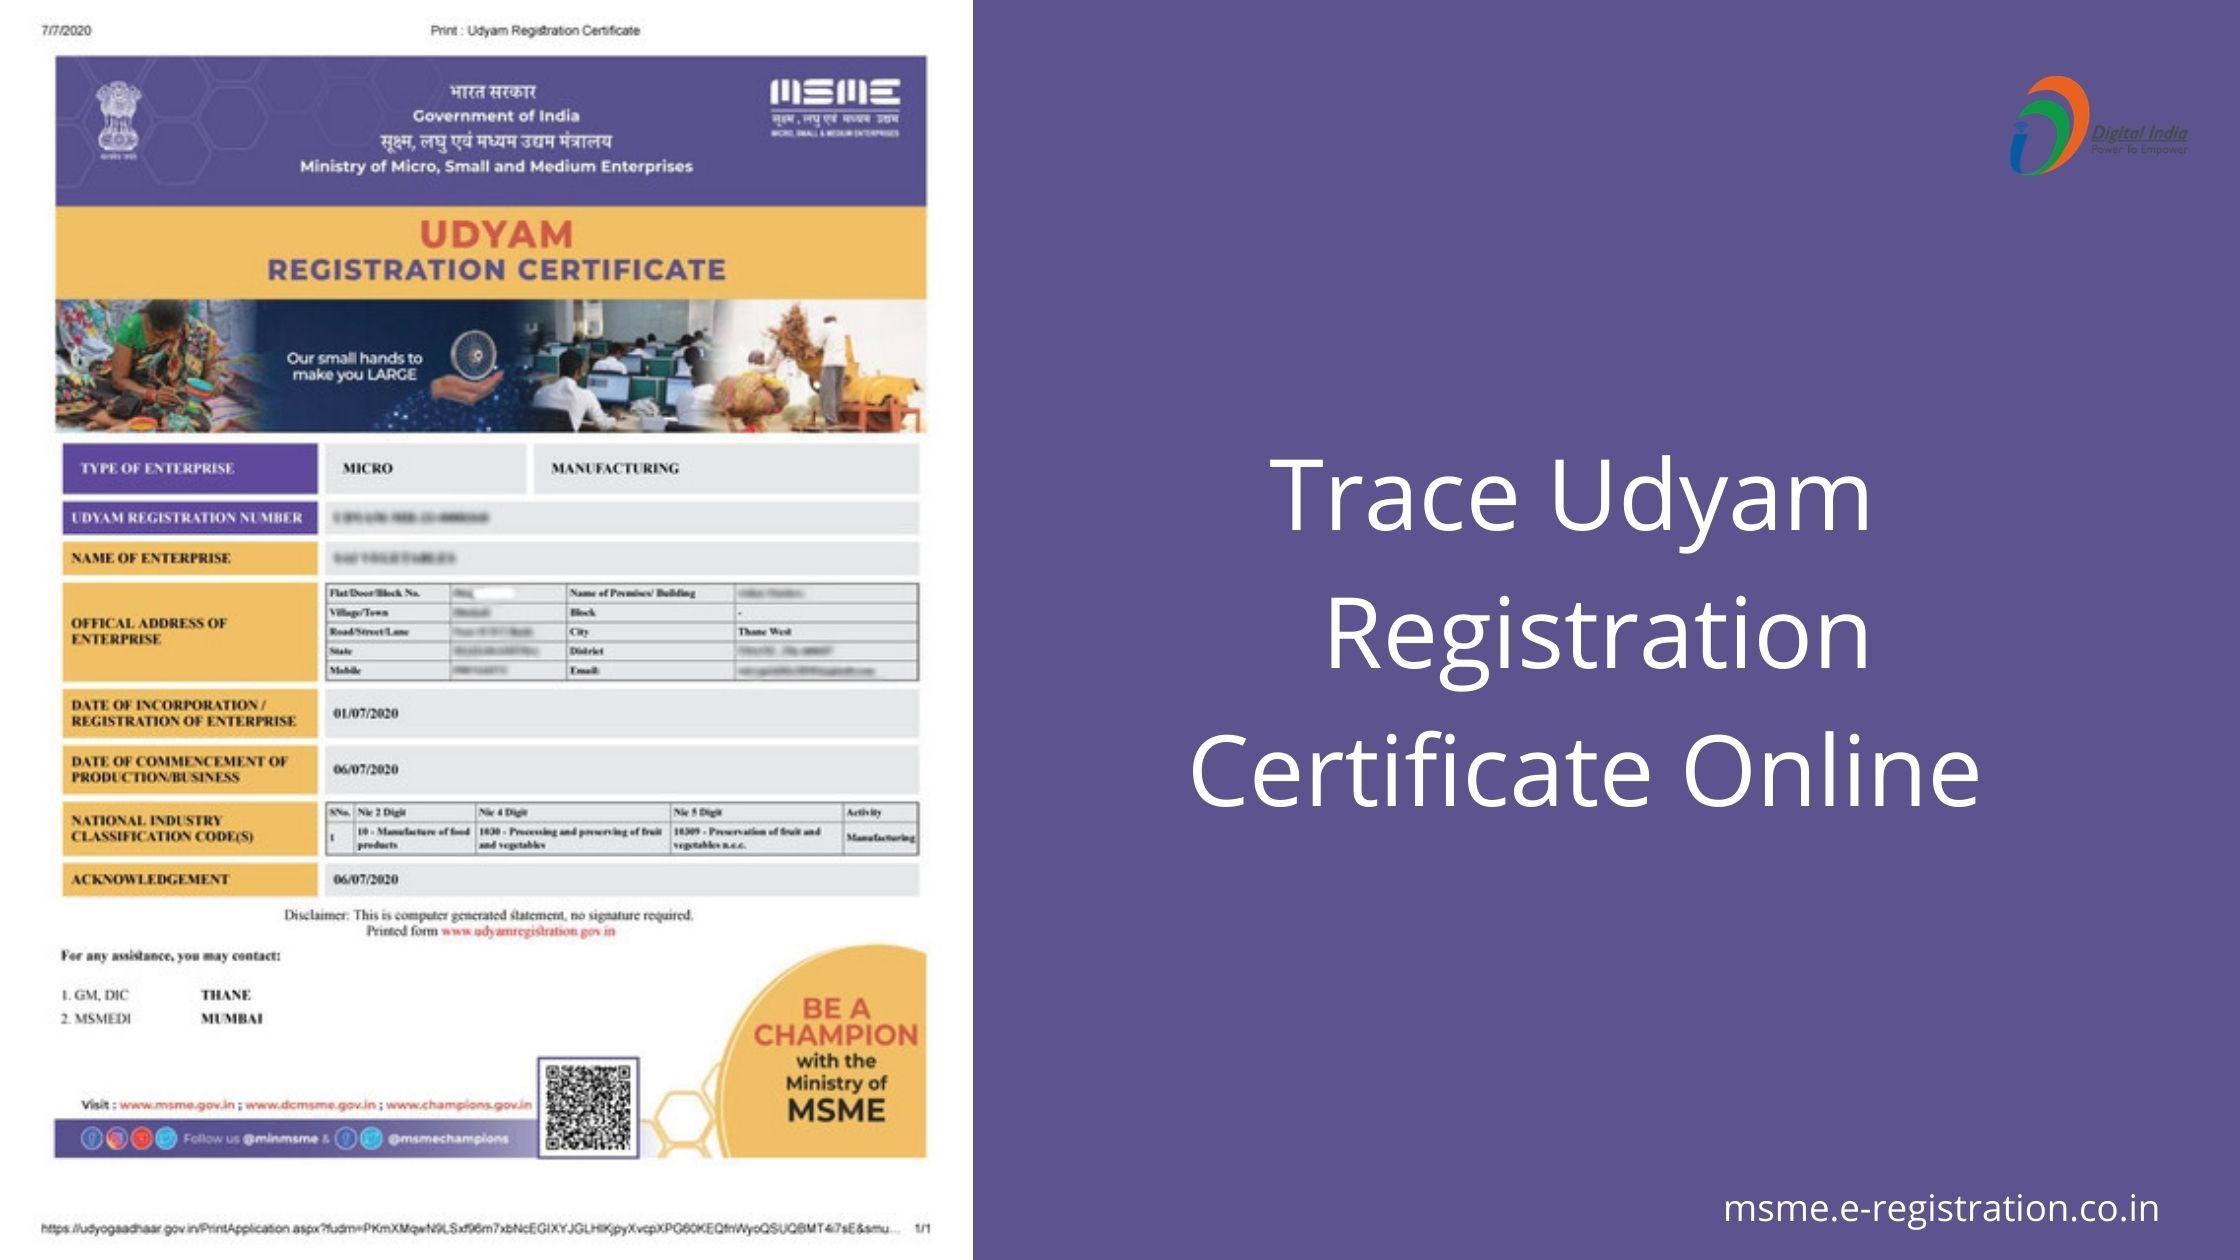 Trace Udyam Registration Certificate Online